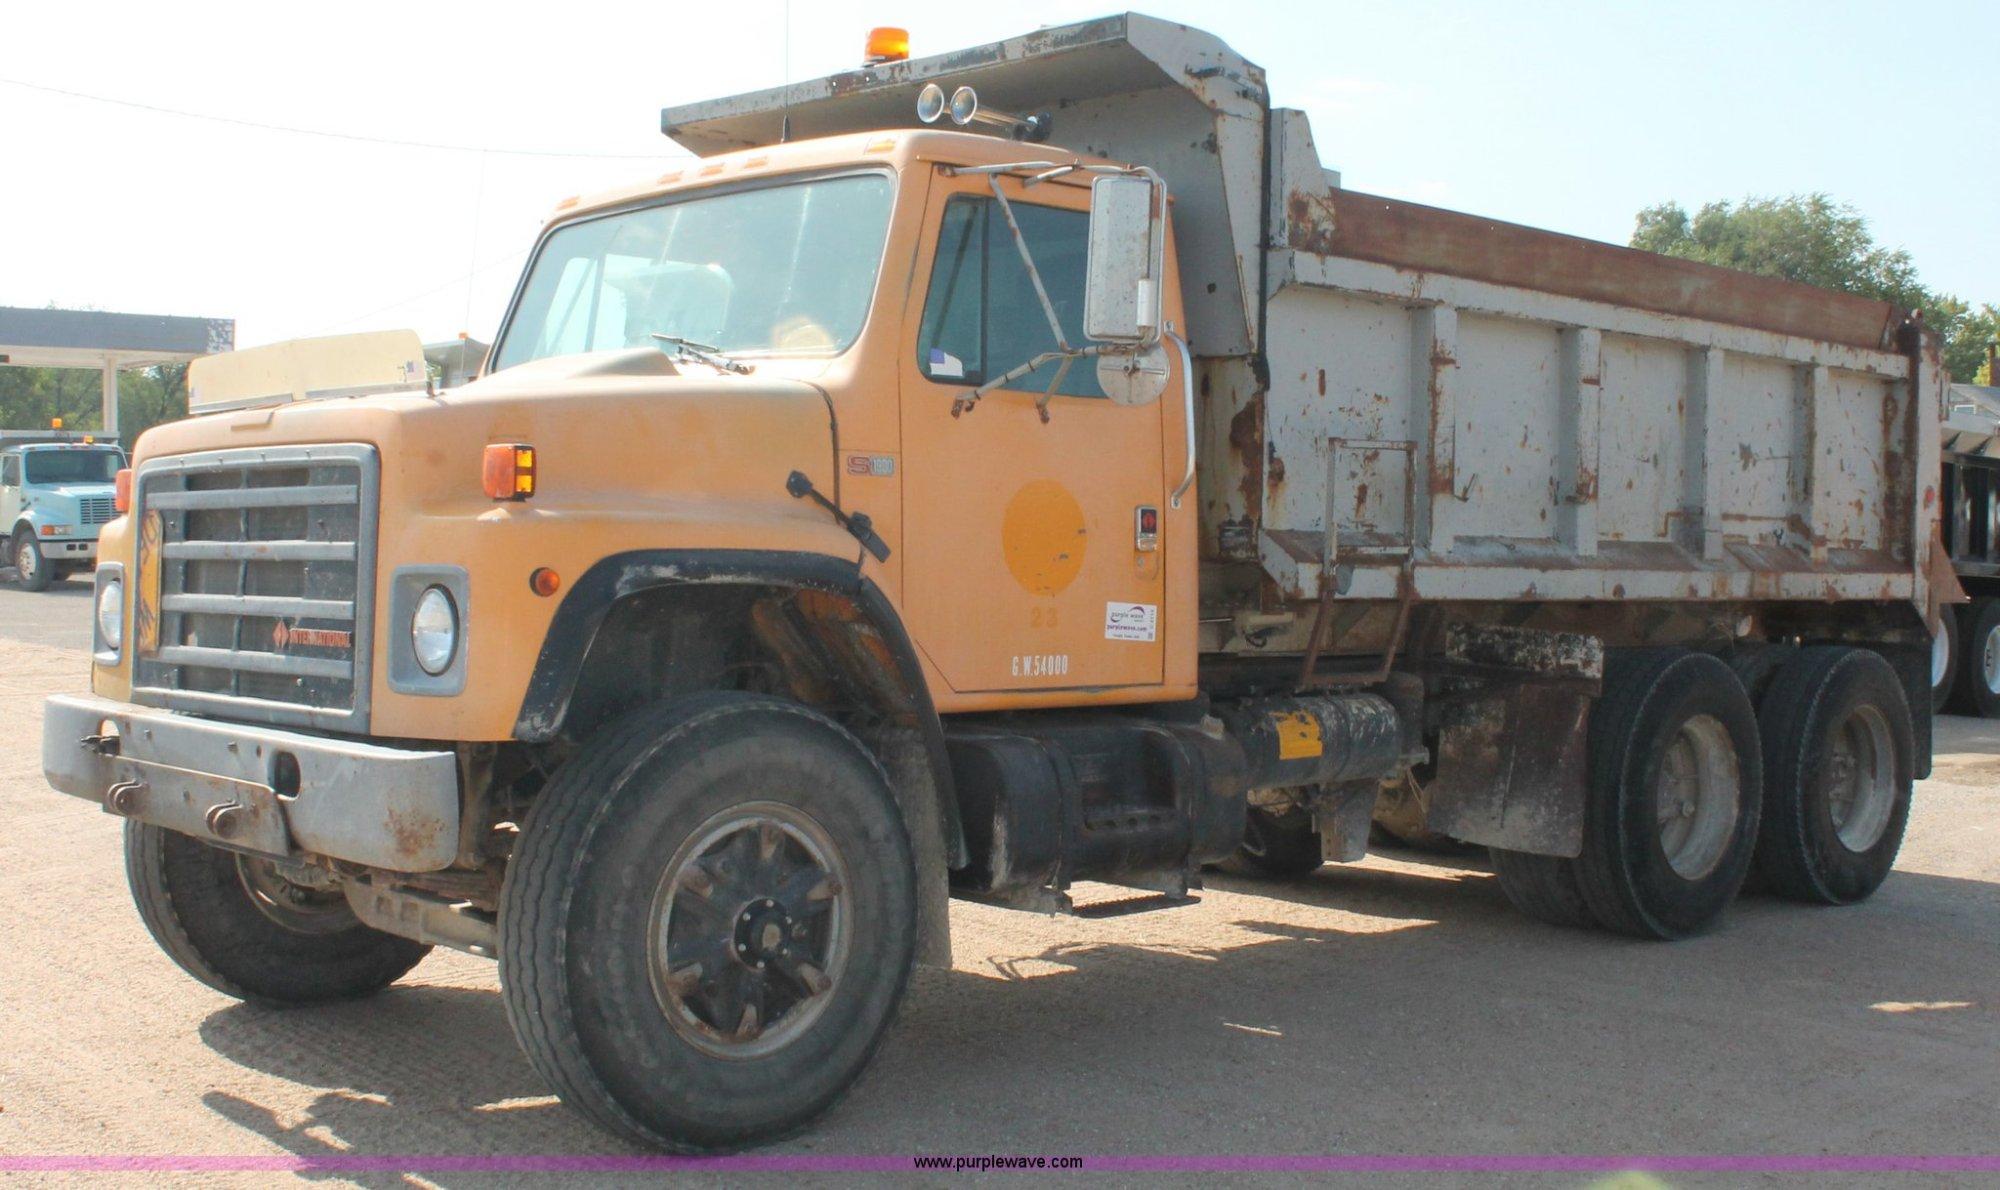 hight resolution of 1989 international s1900 dump truck item c2715 sold tue 1989 international s1900